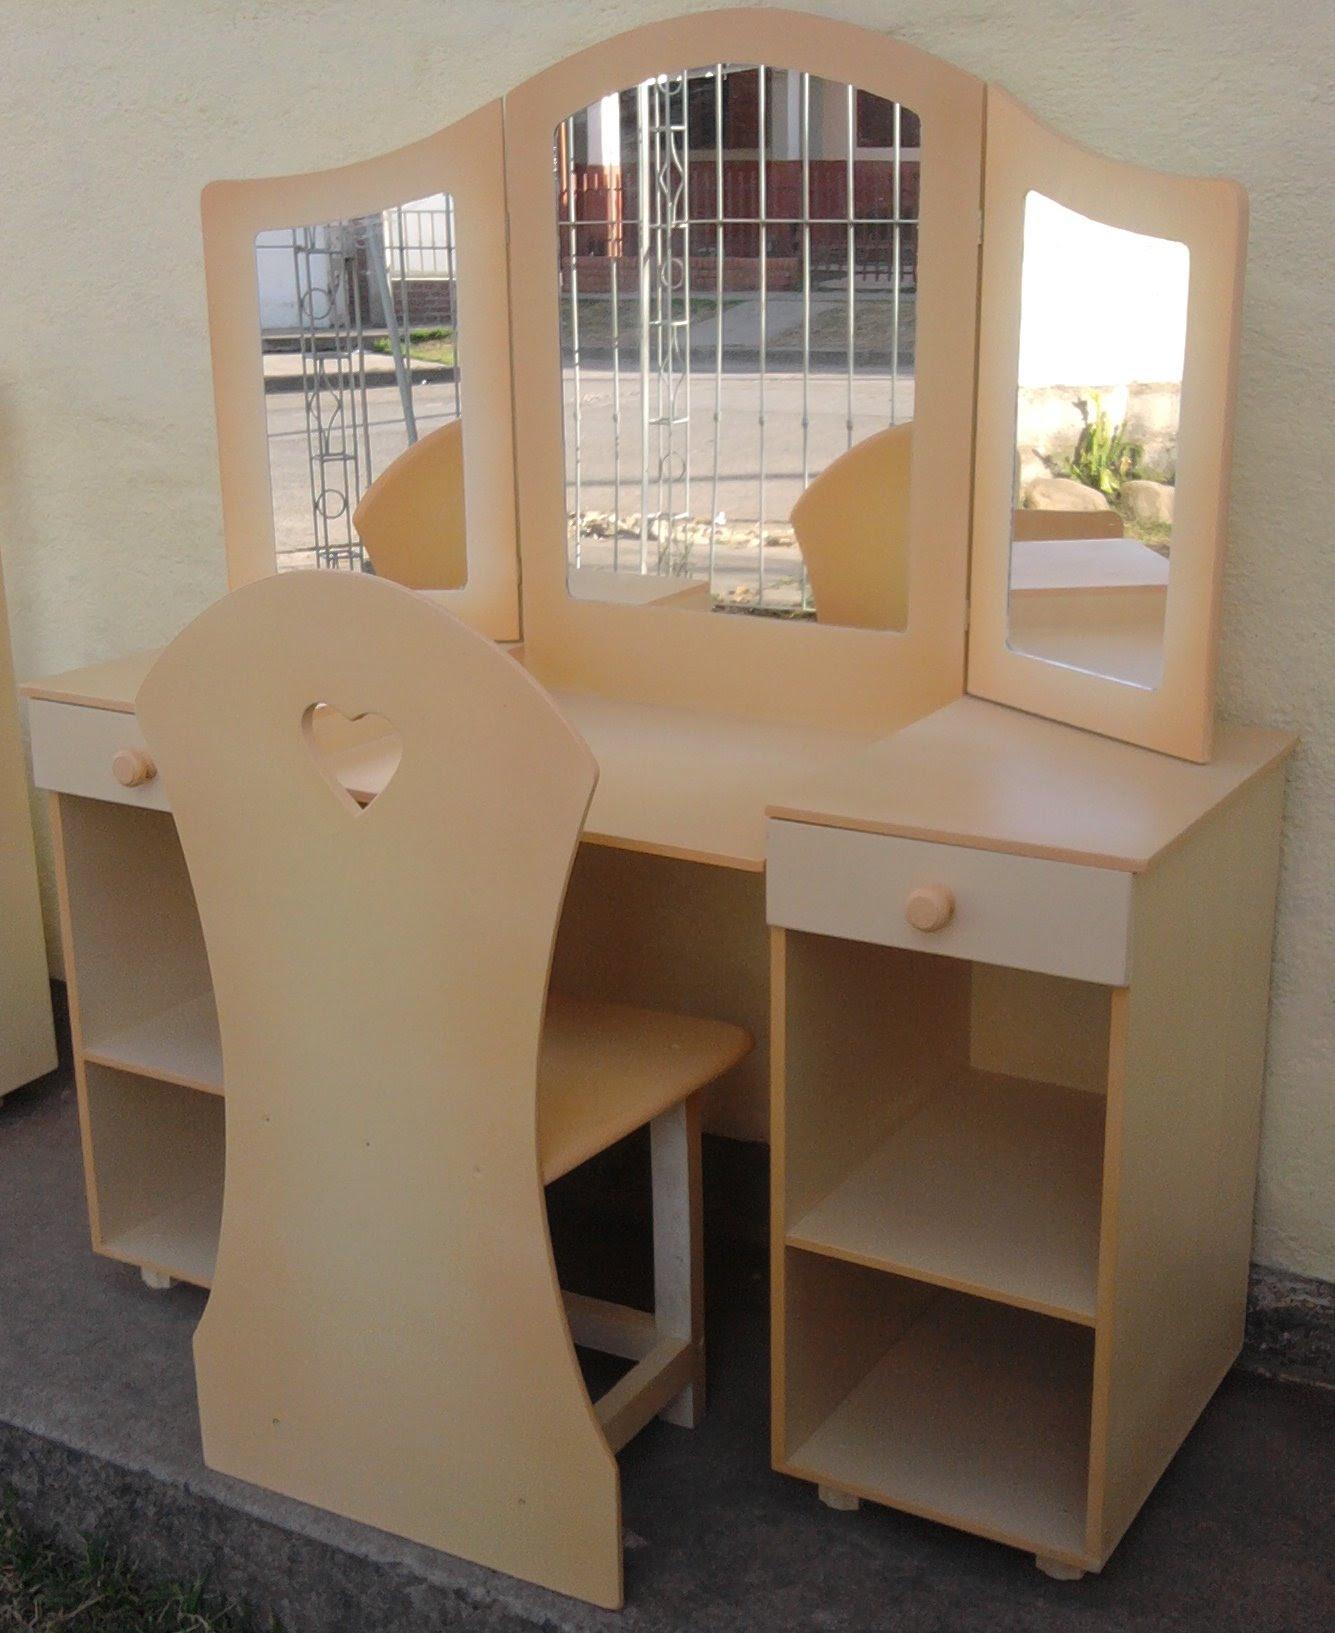 Dormitorio Muebles Modernos Mueble Tocador # Muebles Tocadores Modernos